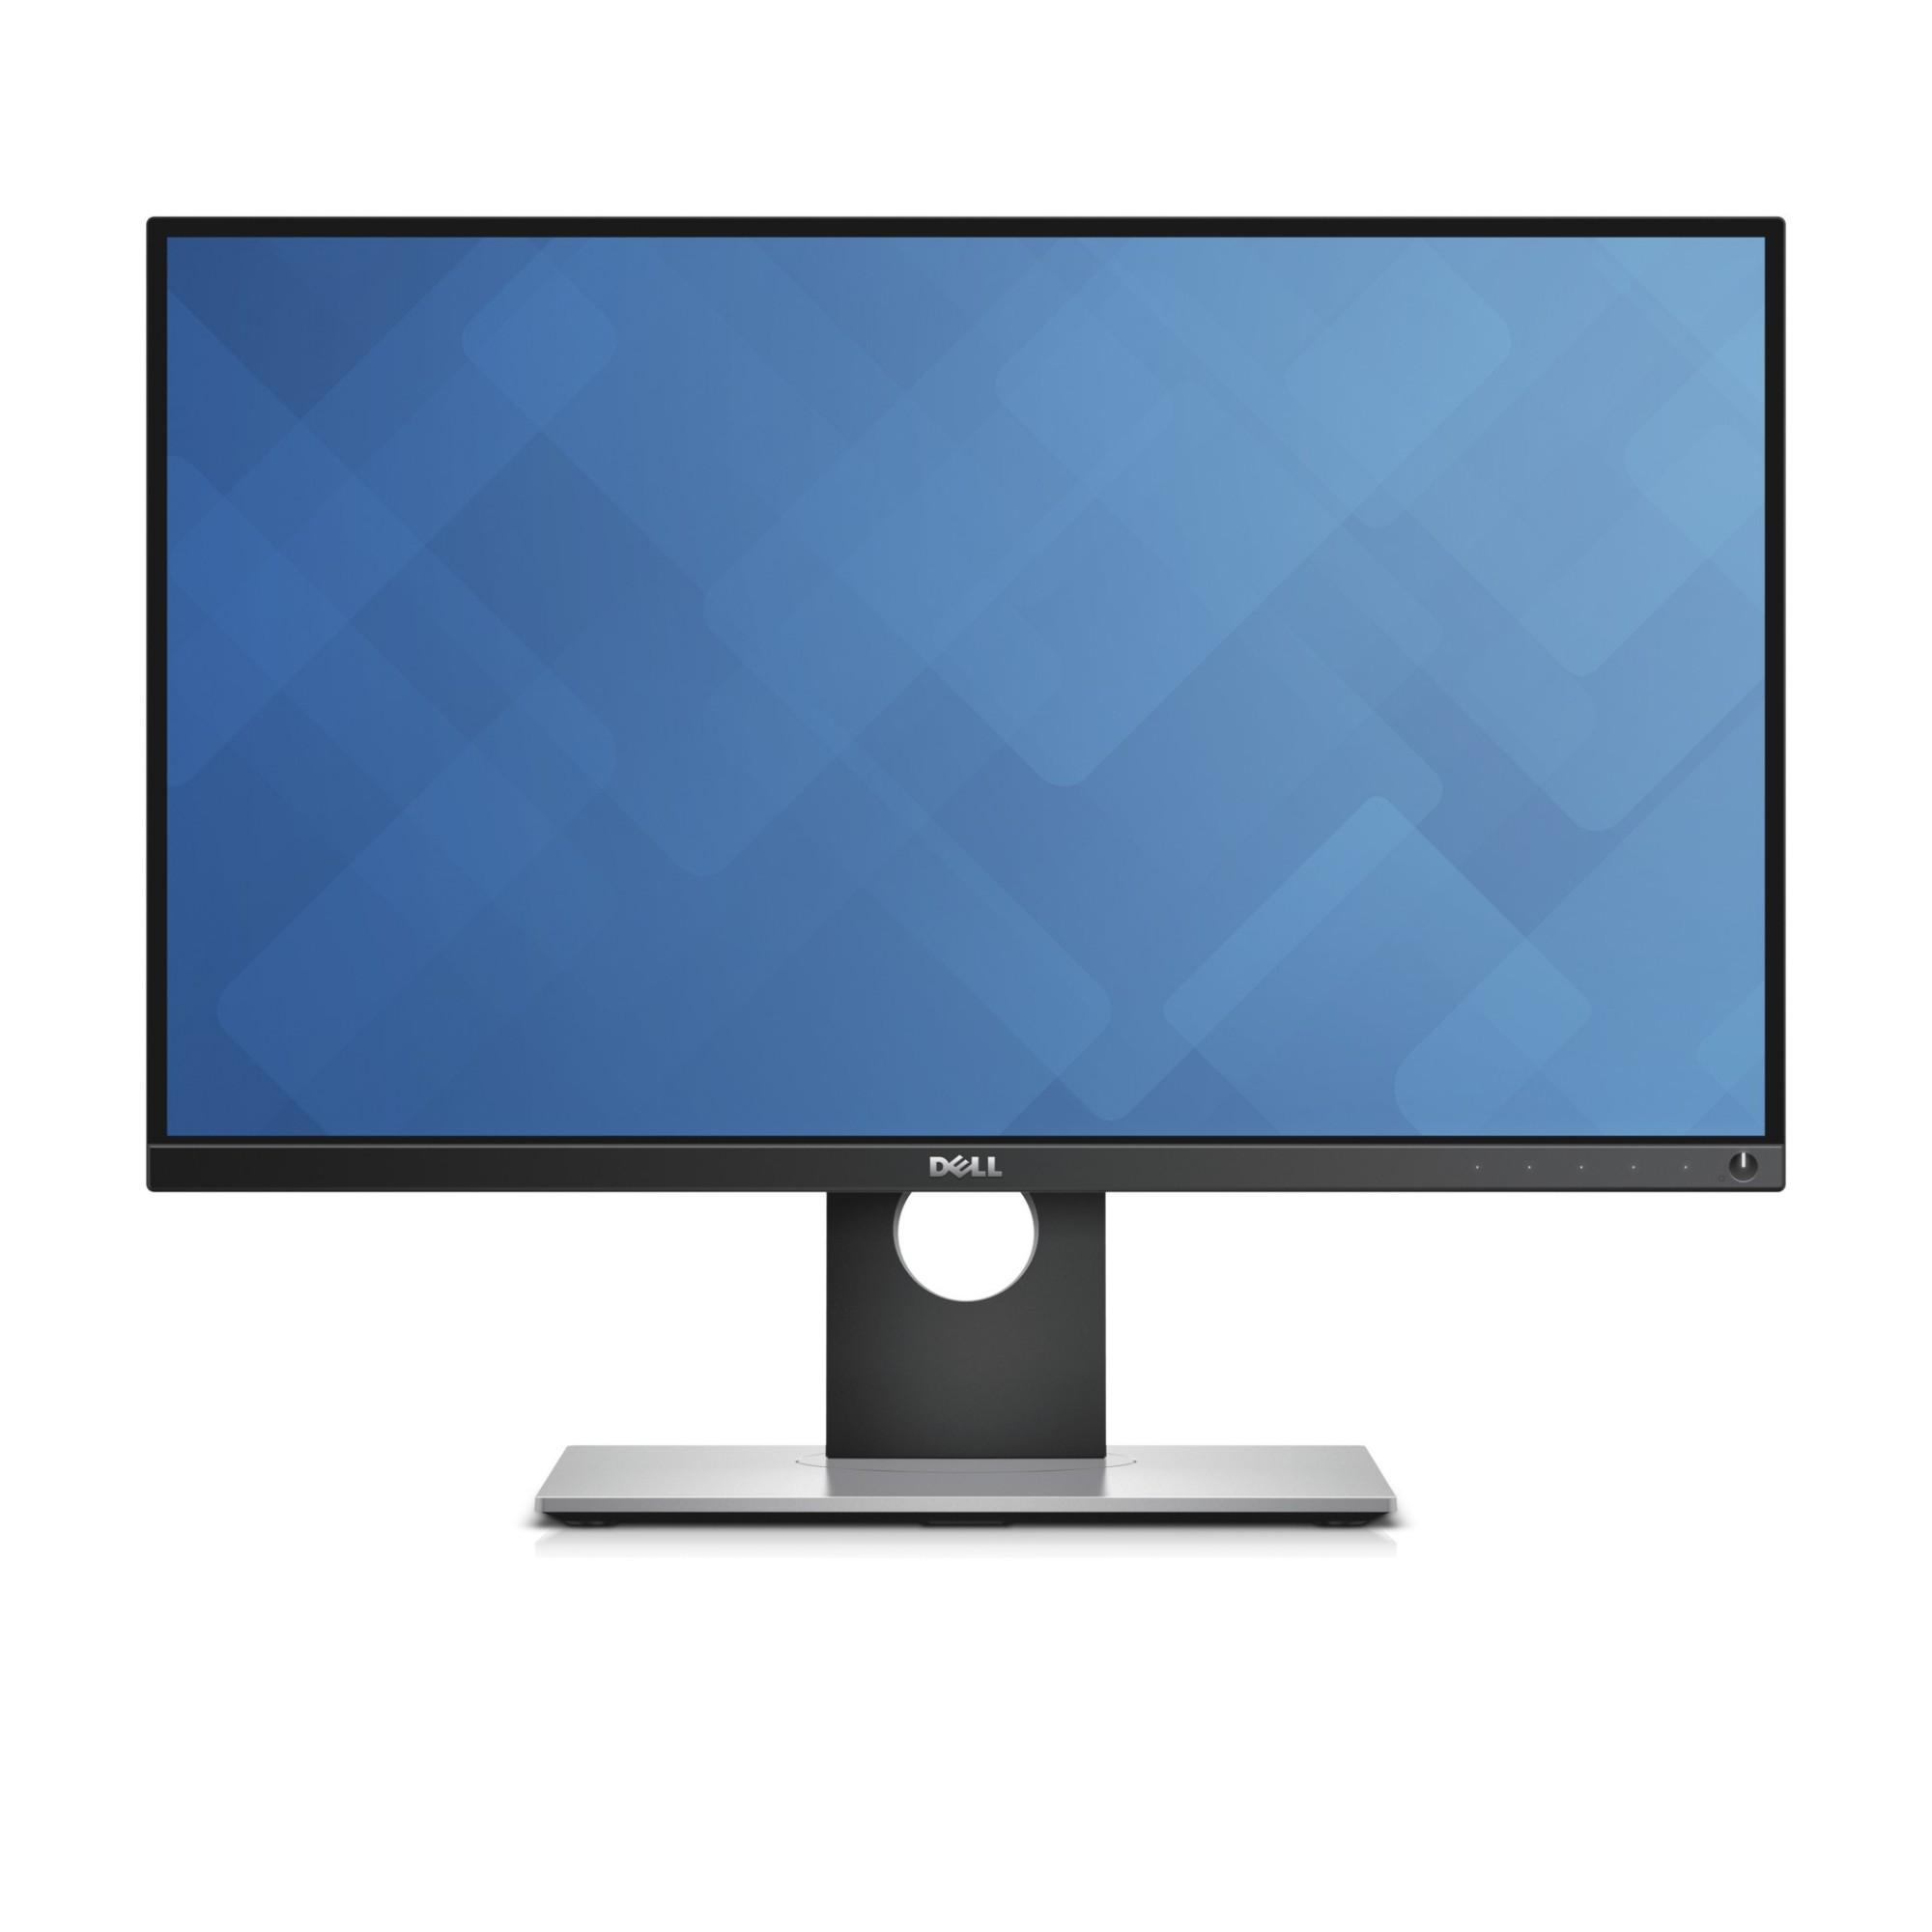 "DELL UltraSharp UP2516D LED display 63,5 cm (25"") 2560 x 1440 Pixeles Wide Quad HD Mate Negro, Plata"